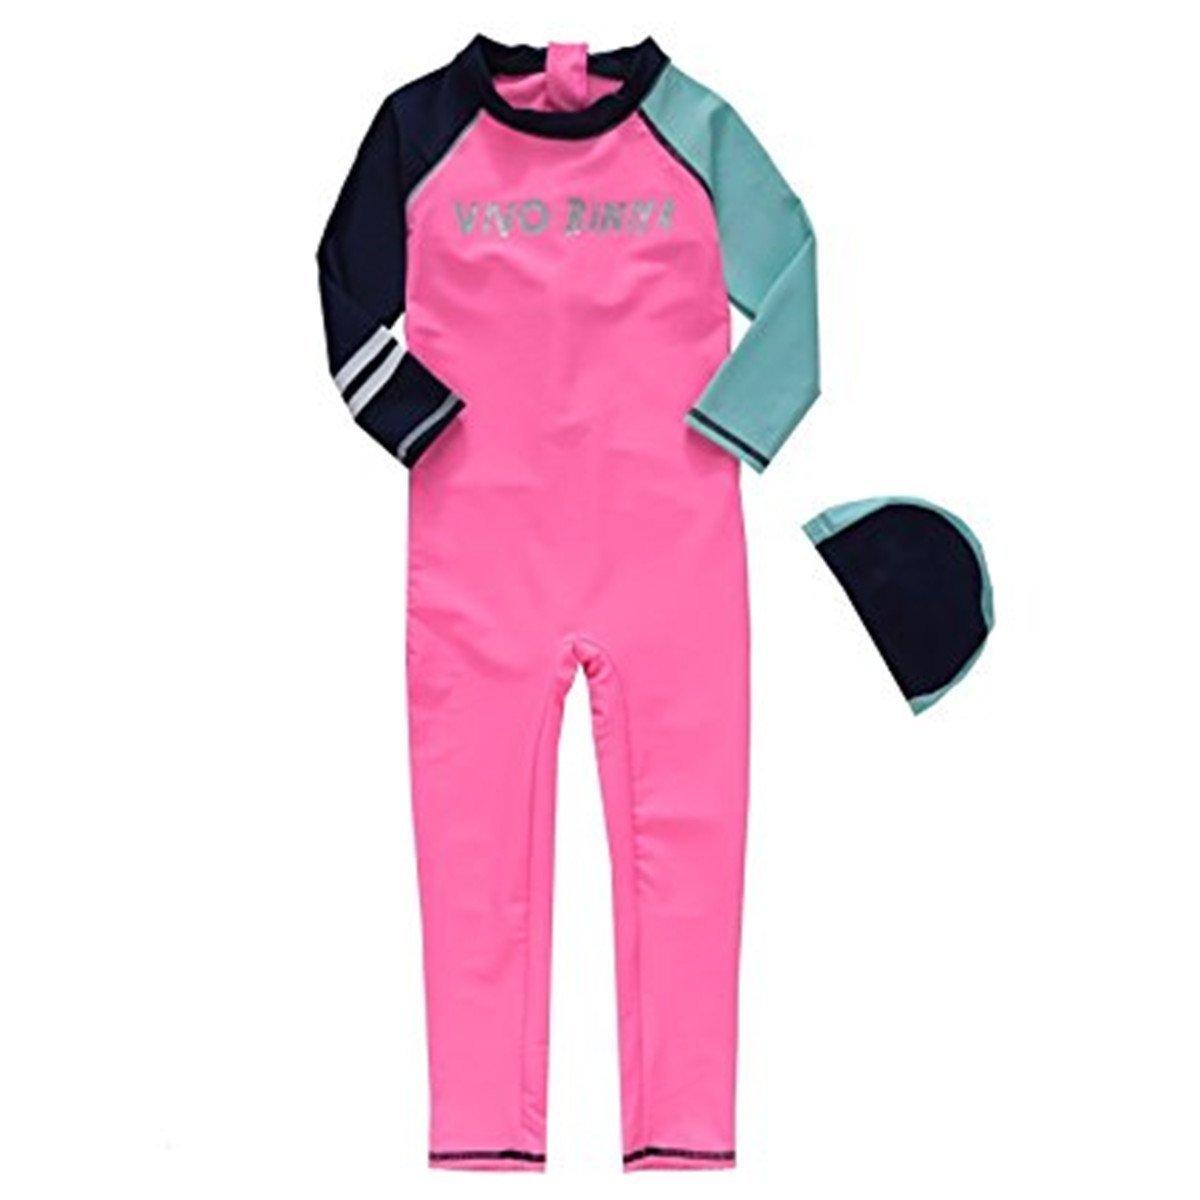 Sun Protection Rash Guard Swimsuit Caps Maylife Baby Kids Girls Boys One Piece Swimwear Long Sleeve UV 50